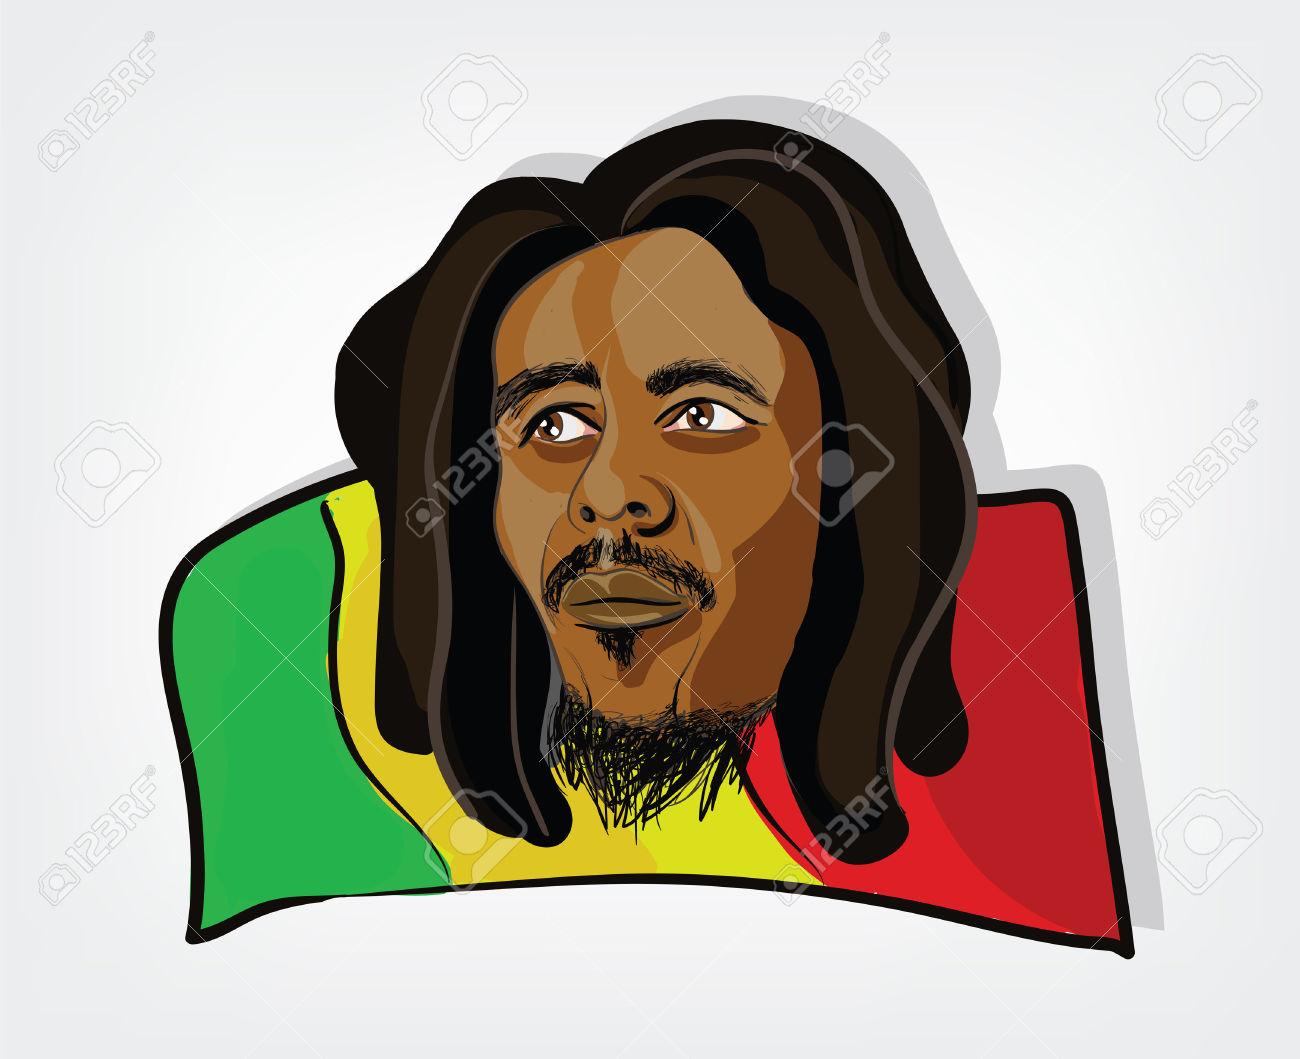 Rastas clipart rastafarian #3